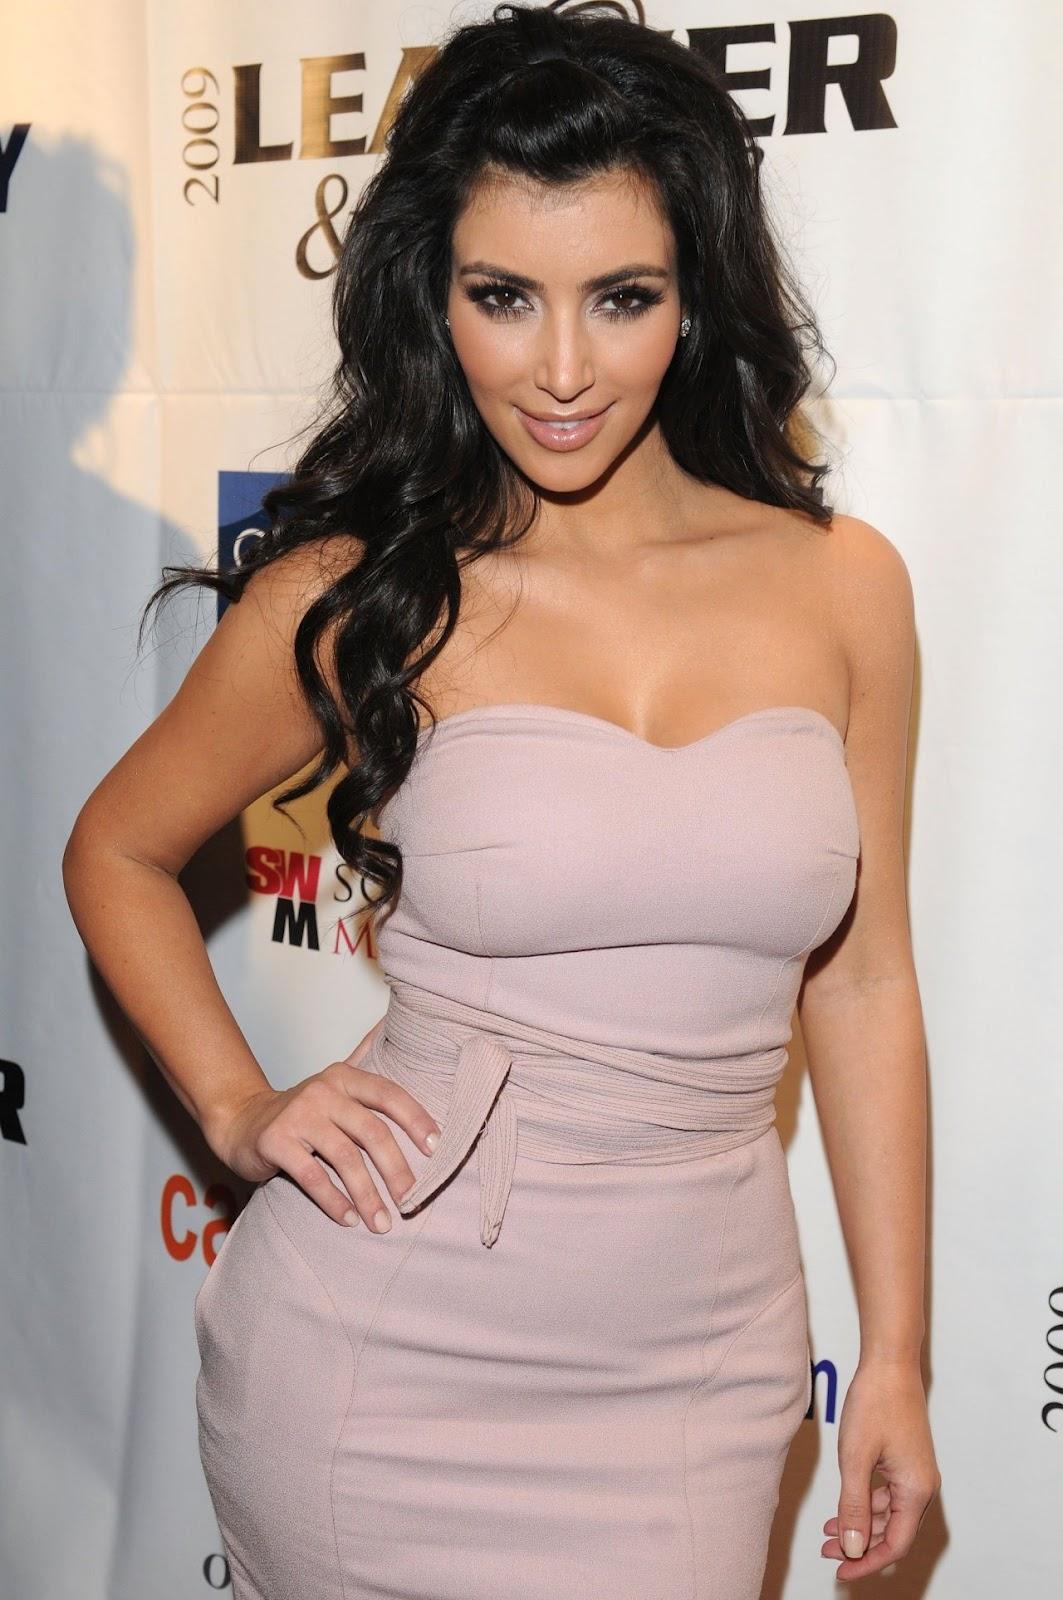 Kim Kardashian Hot Pictures - Kim Kardashian